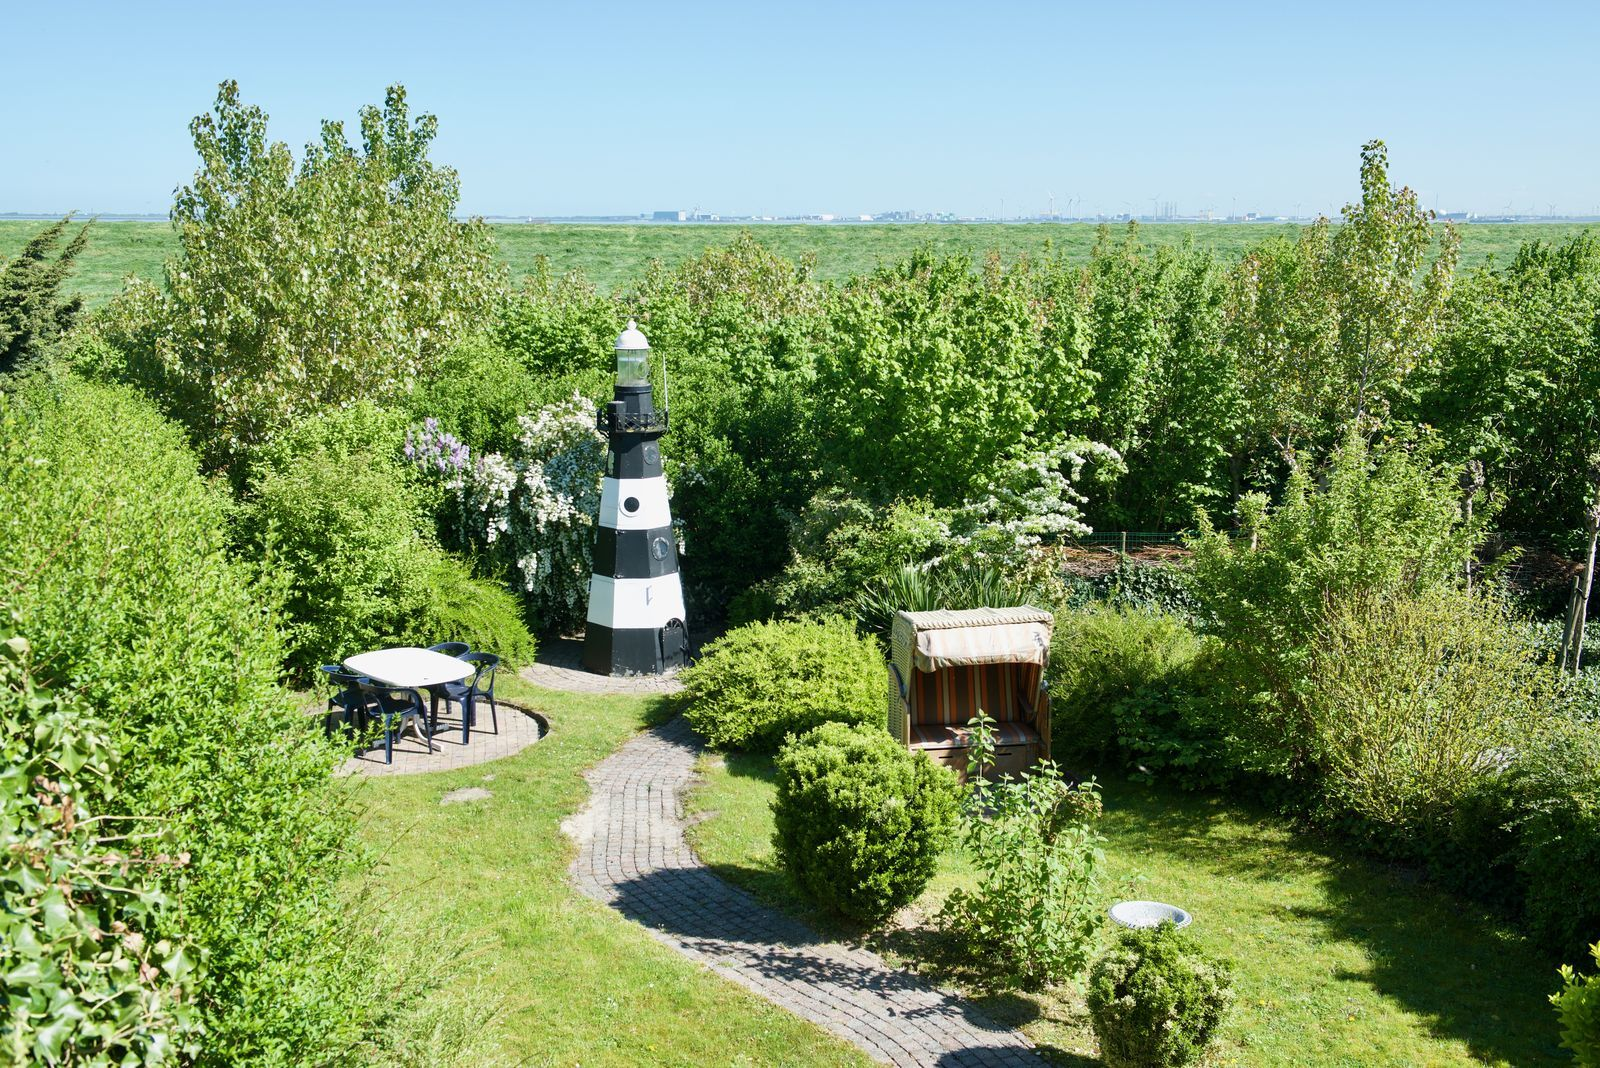 Grimaud 187 - Kustpark Village Scaldia